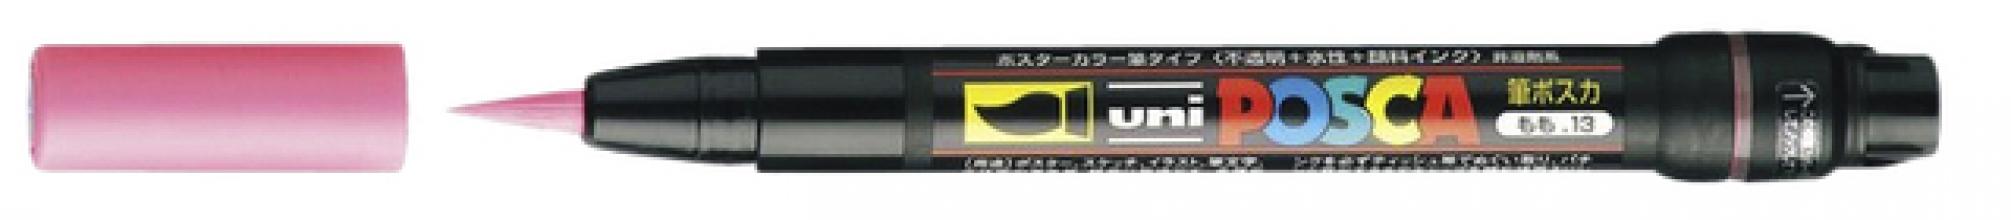 , Brushverfstift Posca PCF350 rood